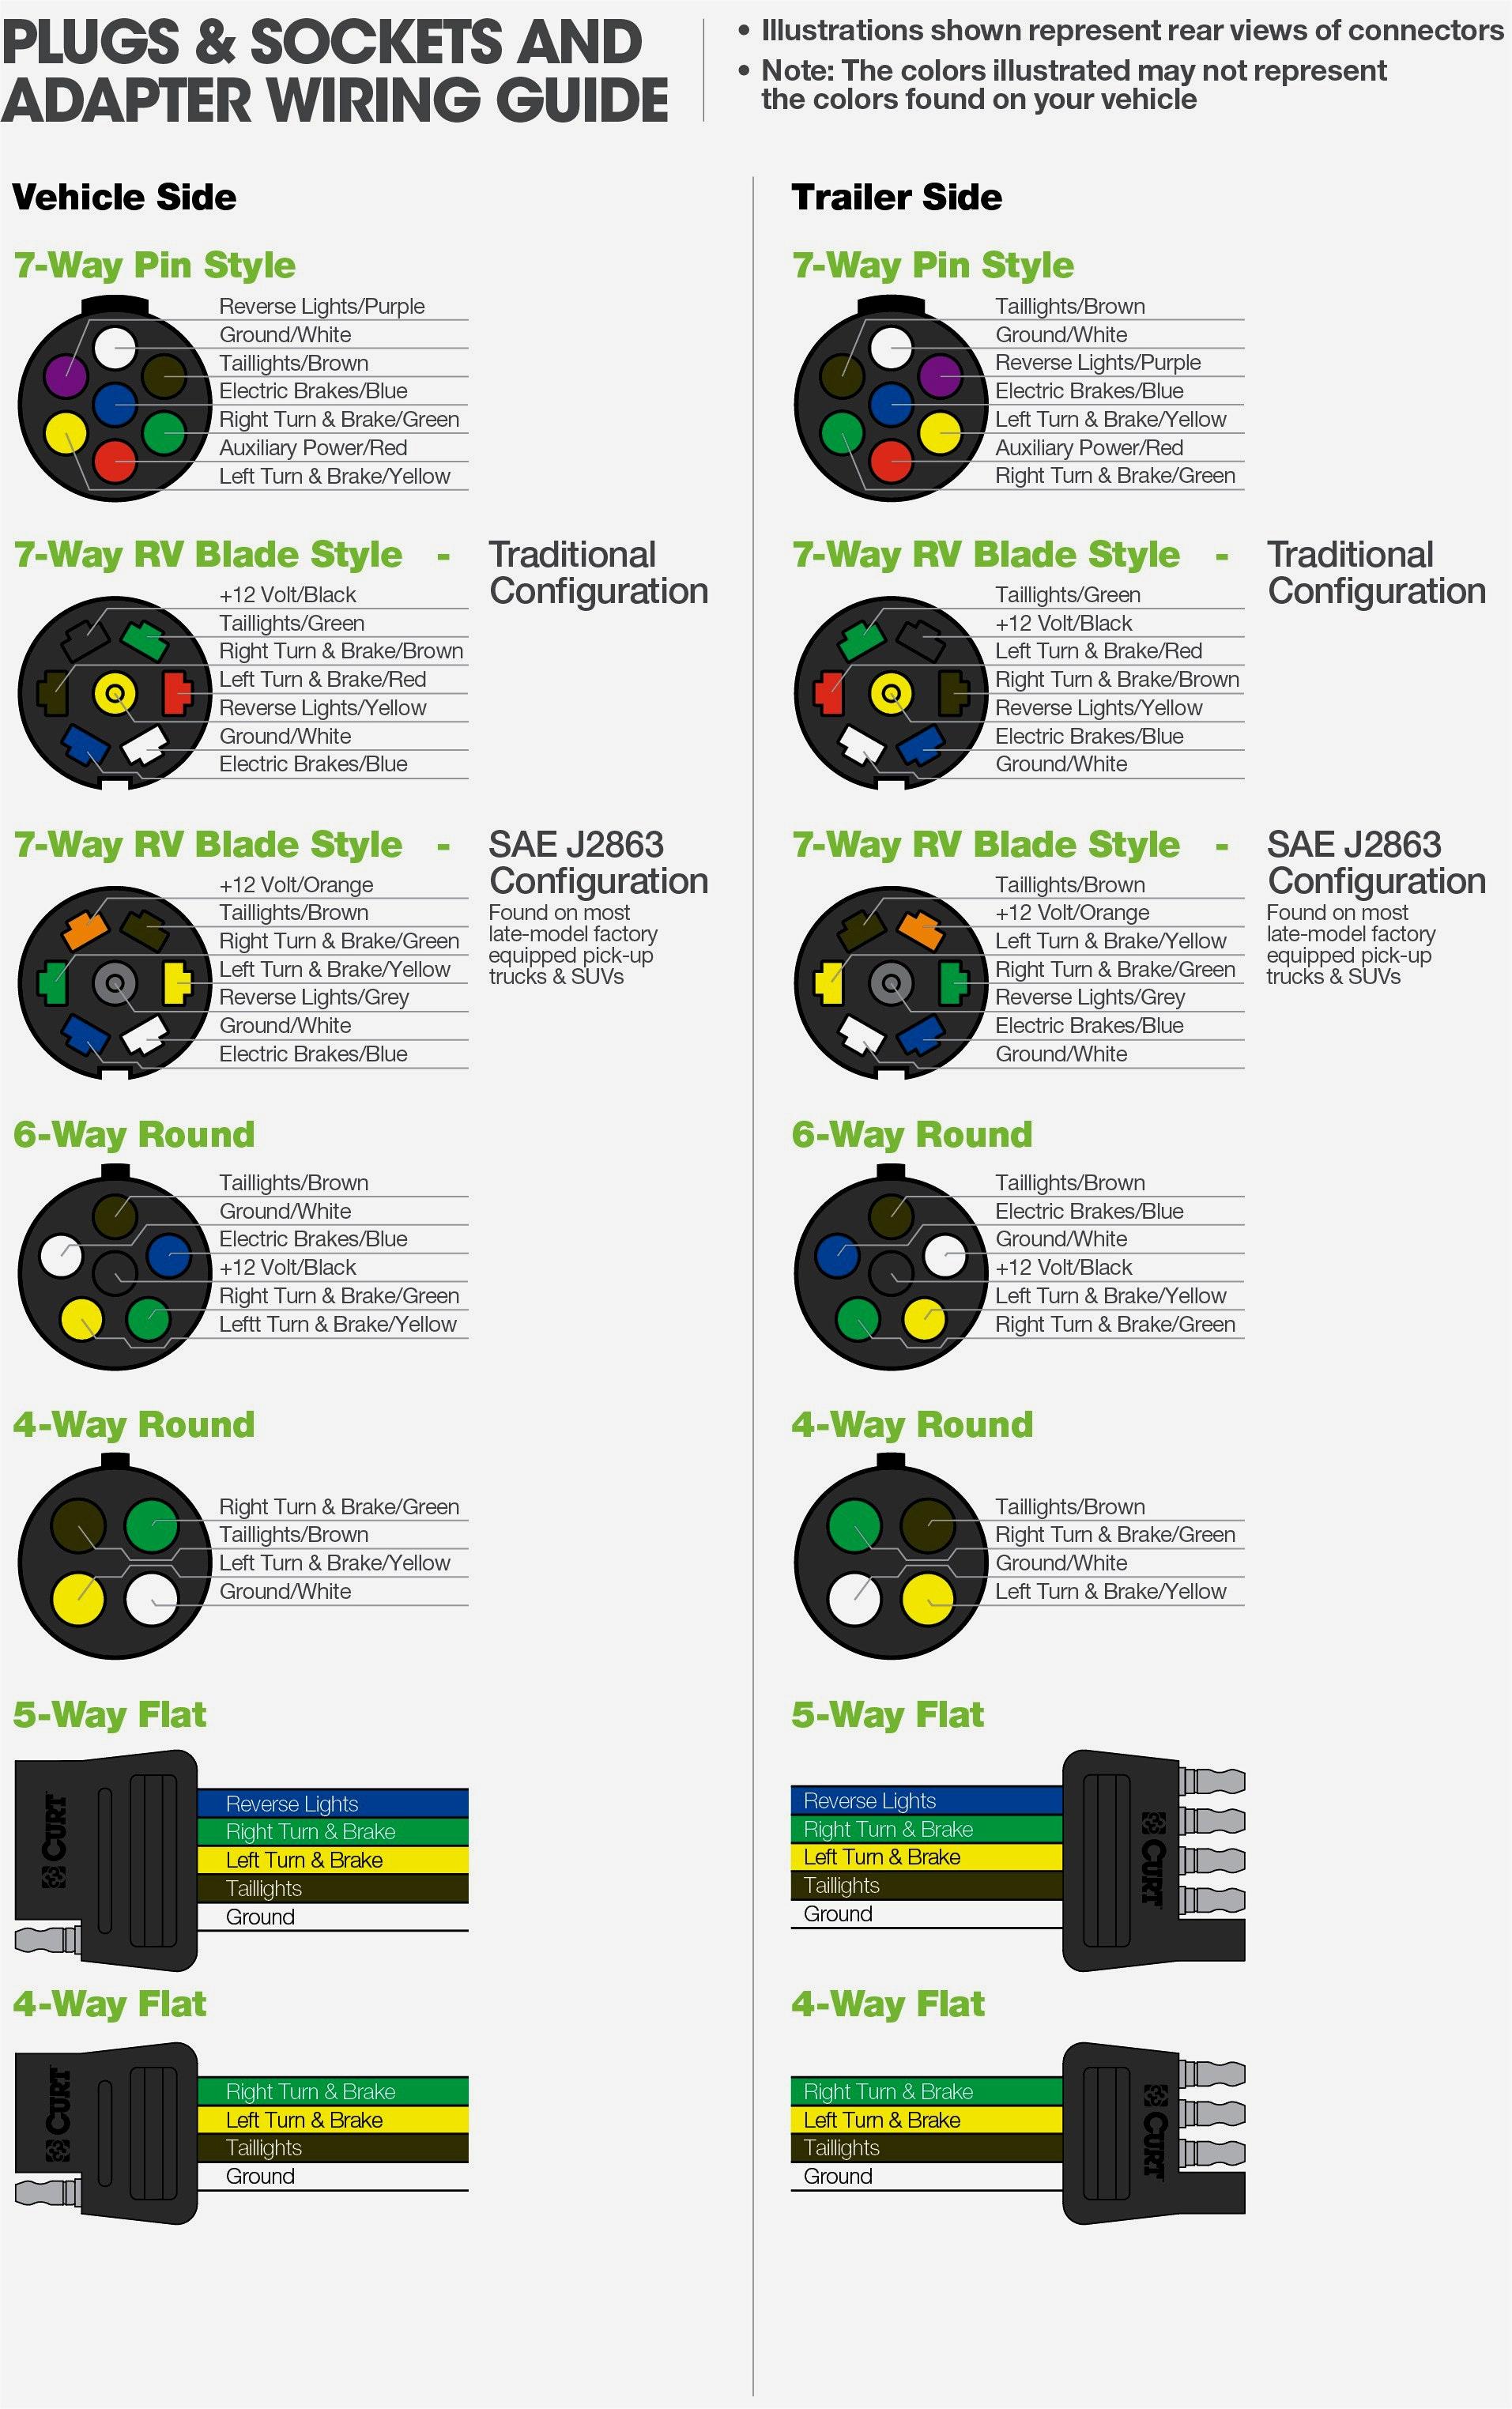 [DIAGRAM_38EU]  Zieman Trailer Wiring Diagram | Zieman Trailer Wiring Diagram |  | Wiring Database